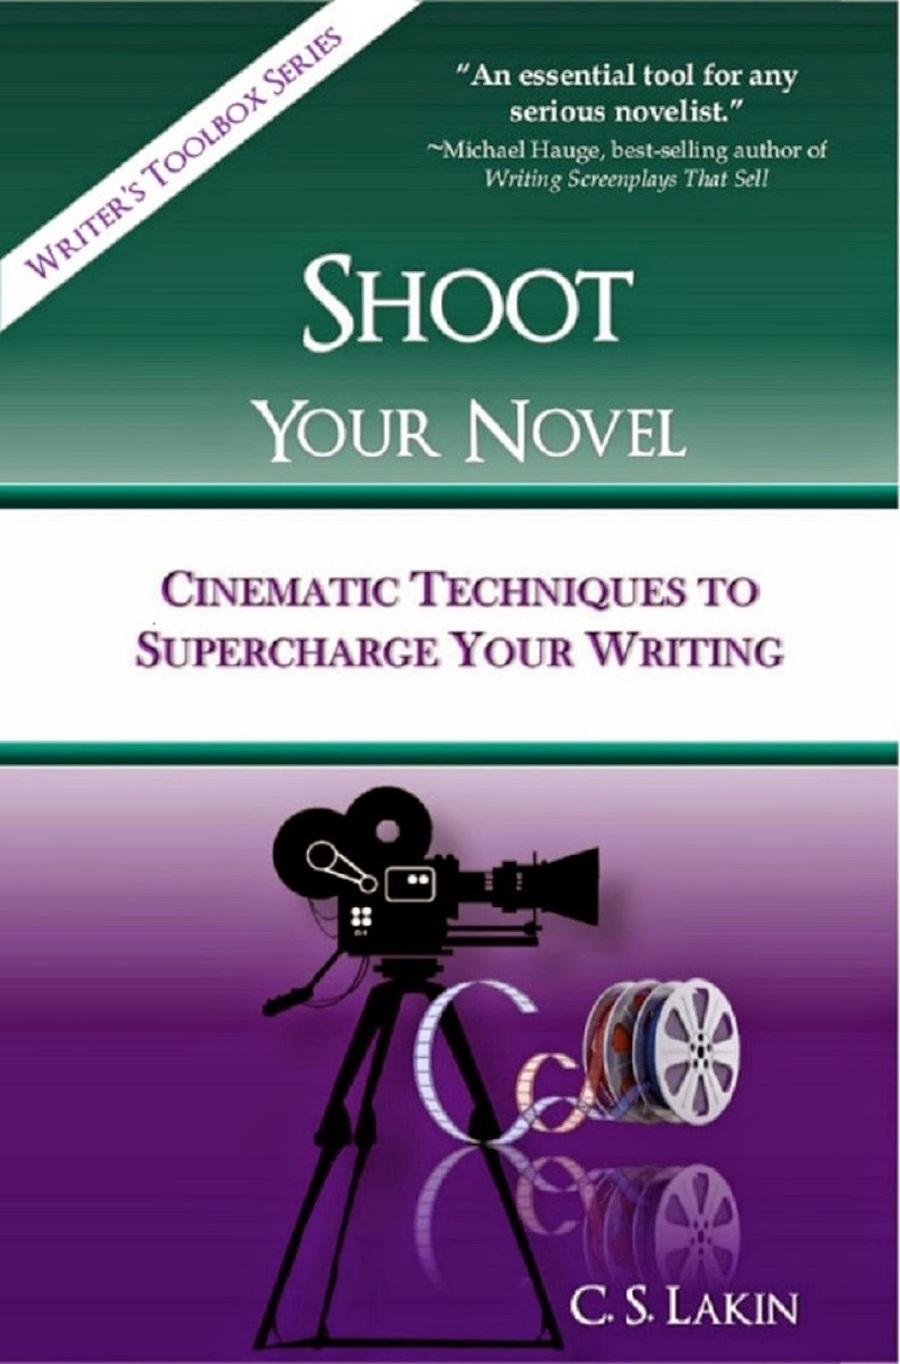 Shoot your novel ebook cover final 1400 pixels wide